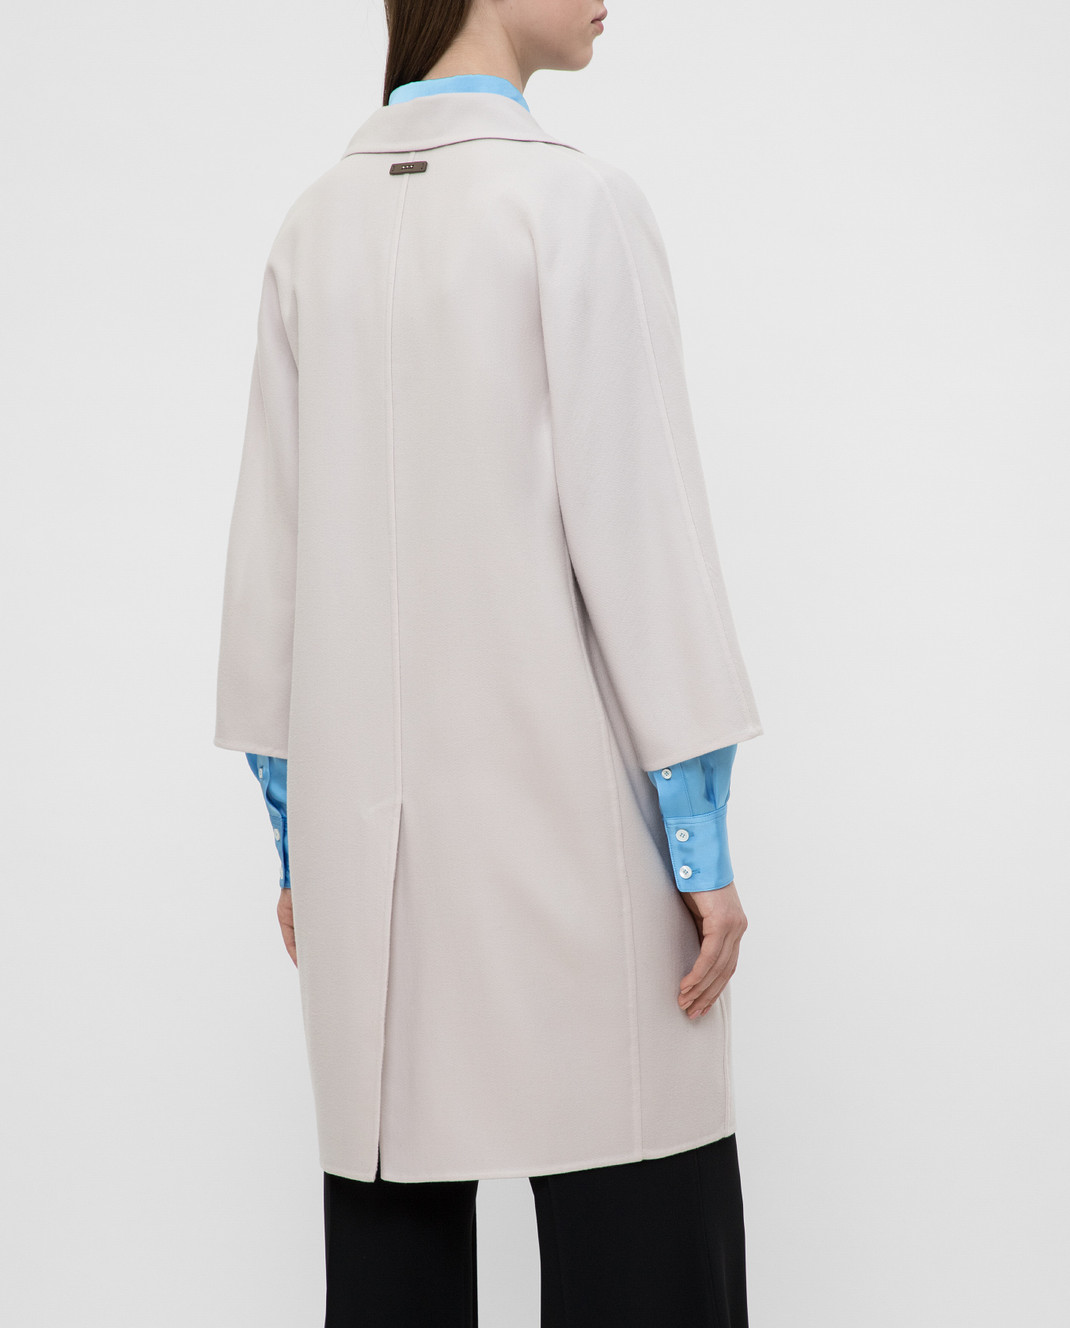 Peserico Светло-бежевое пальто из кашемира и шерсти S20493E изображение 4